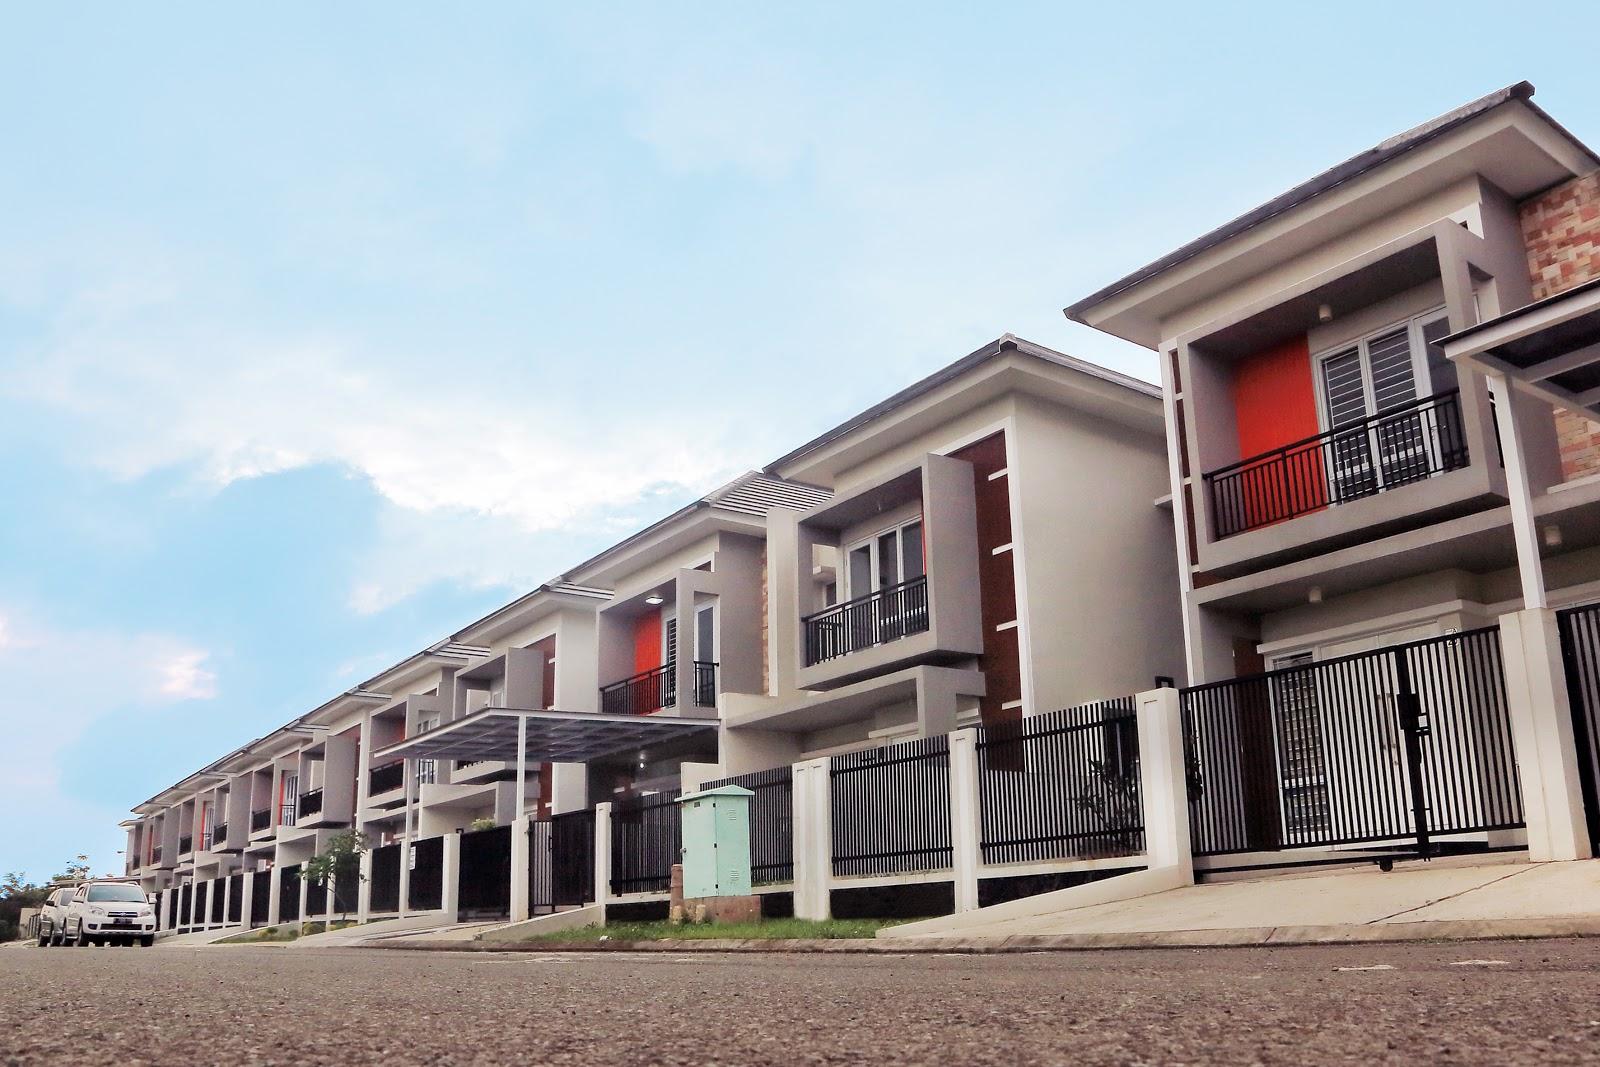 kepowanmetlandrumahidamaninvestasimasadepan-perumahanmetlandpersembahandeveloperpropertyterbaikdiindonesia4.jpg